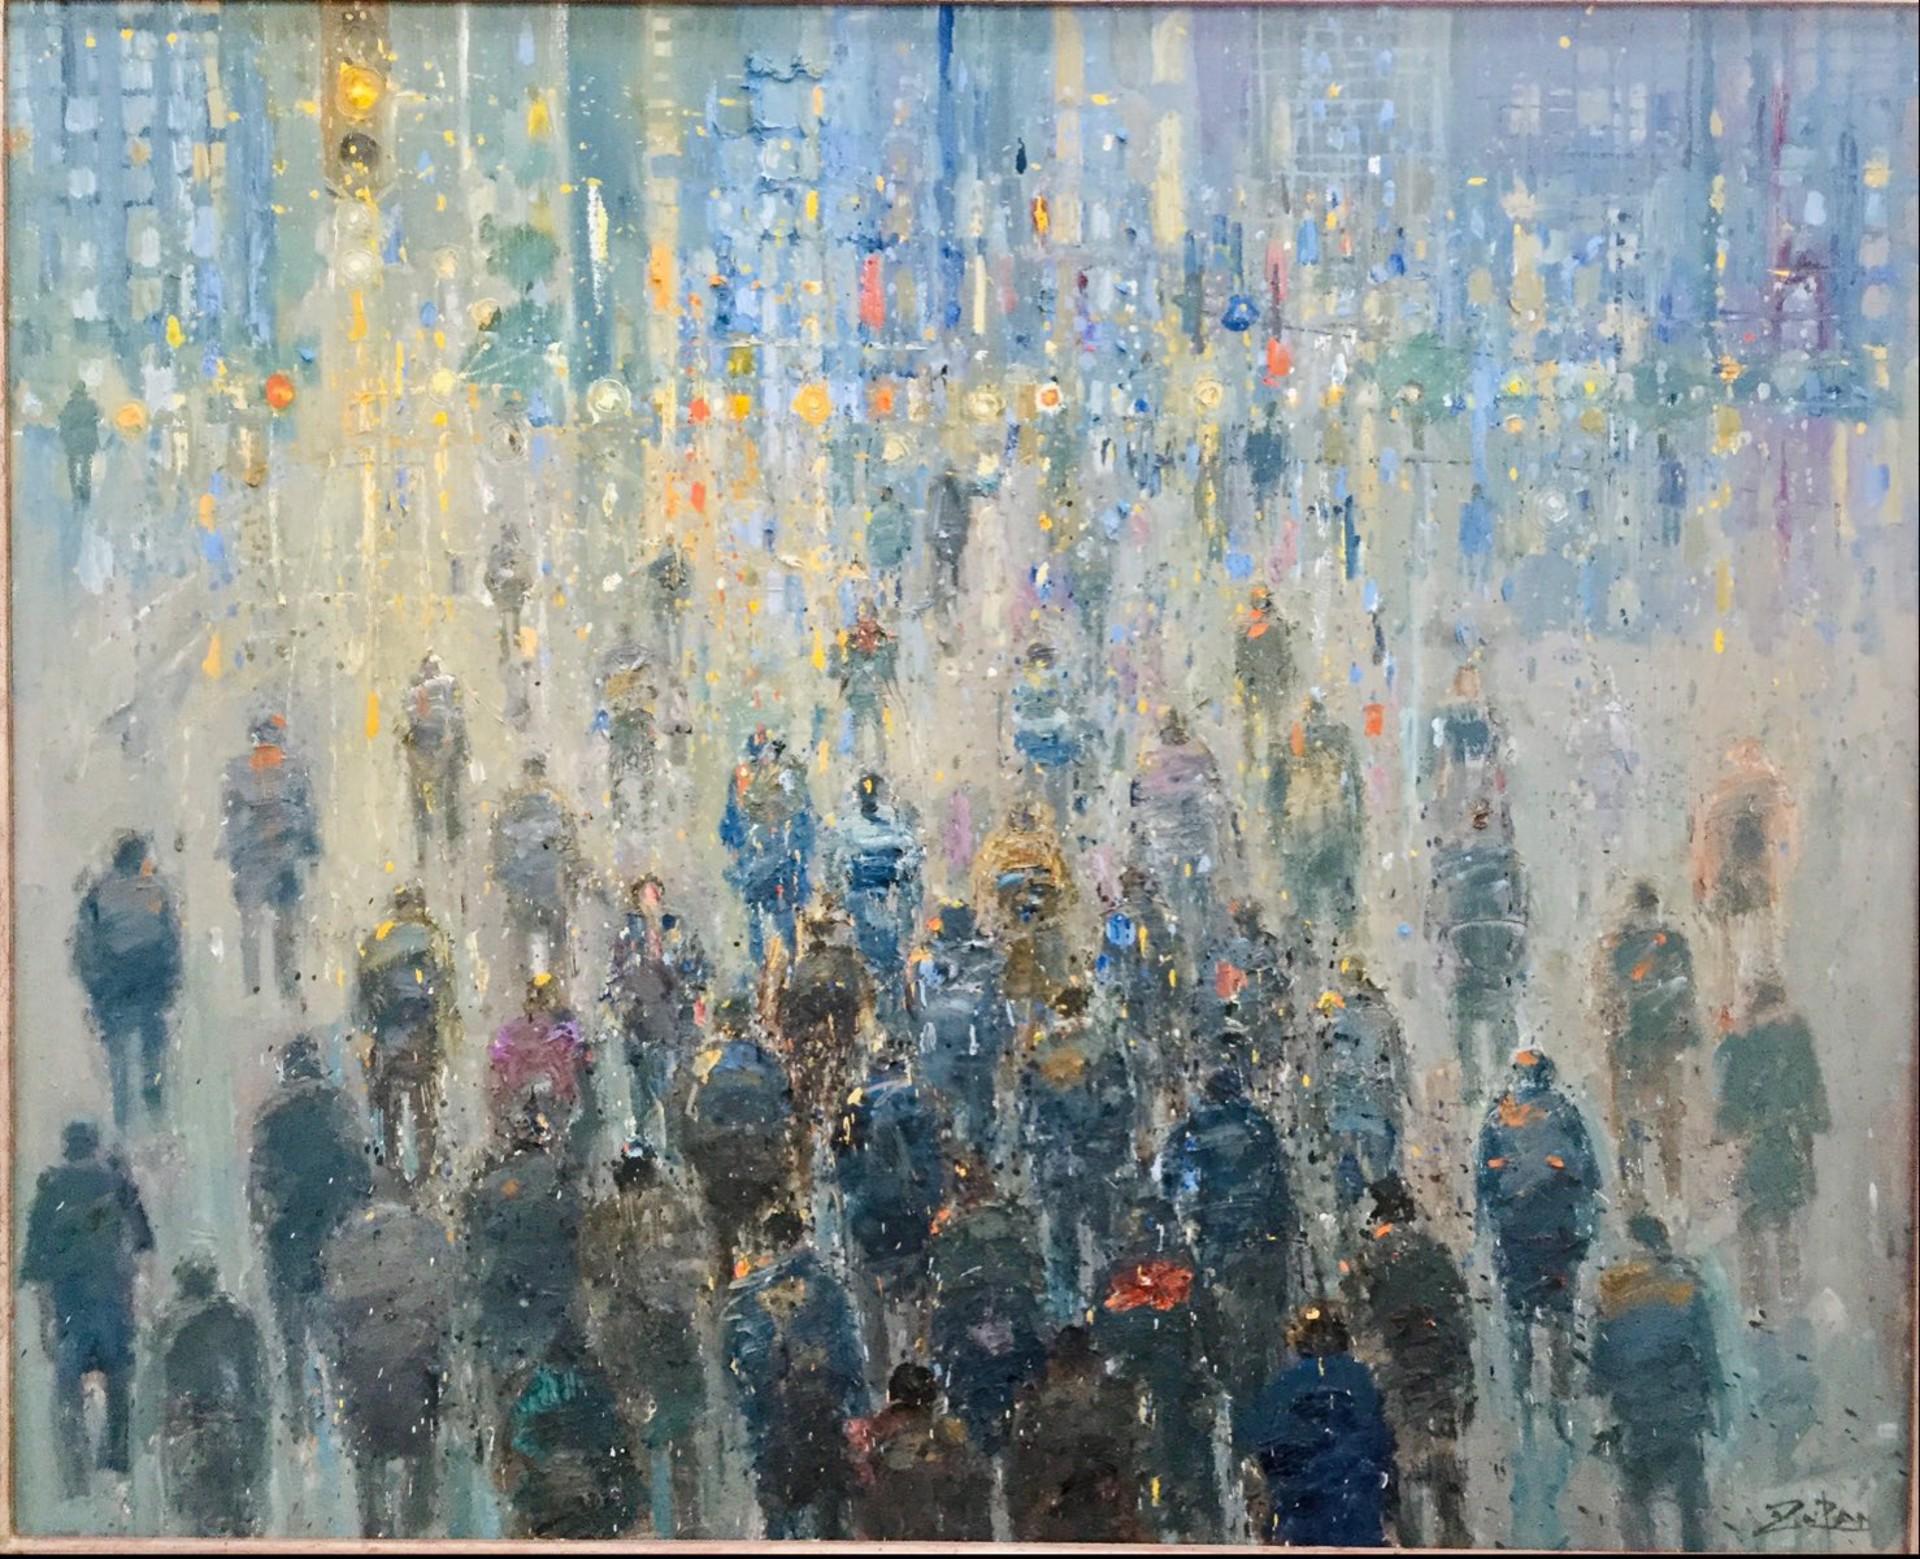 Crosswalk at Twilight by Bruno Zupan